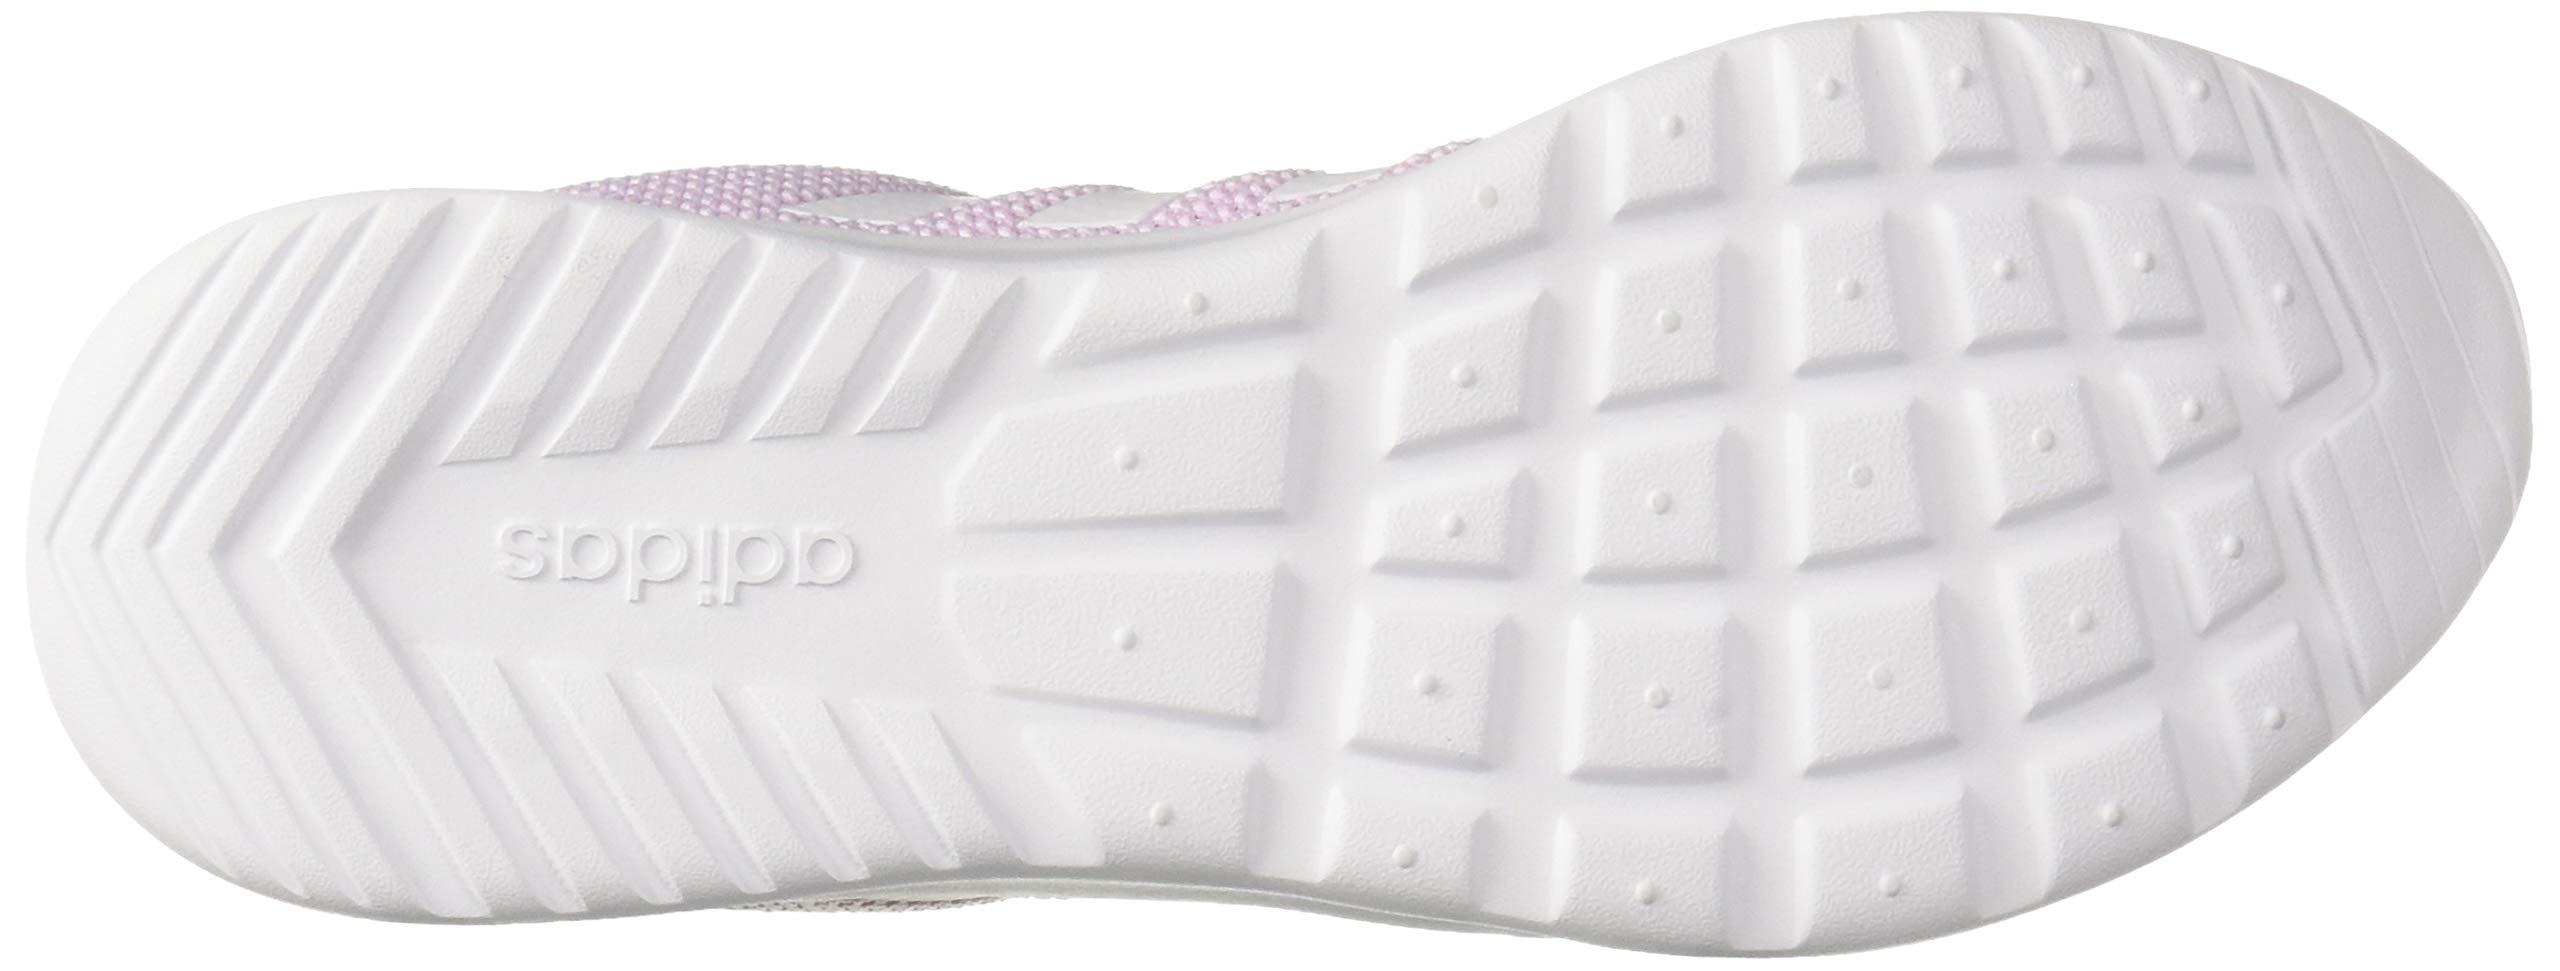 adidas Women's Cloudfoam QT Racer, White/aero Pink, 5.5 M US by adidas (Image #3)